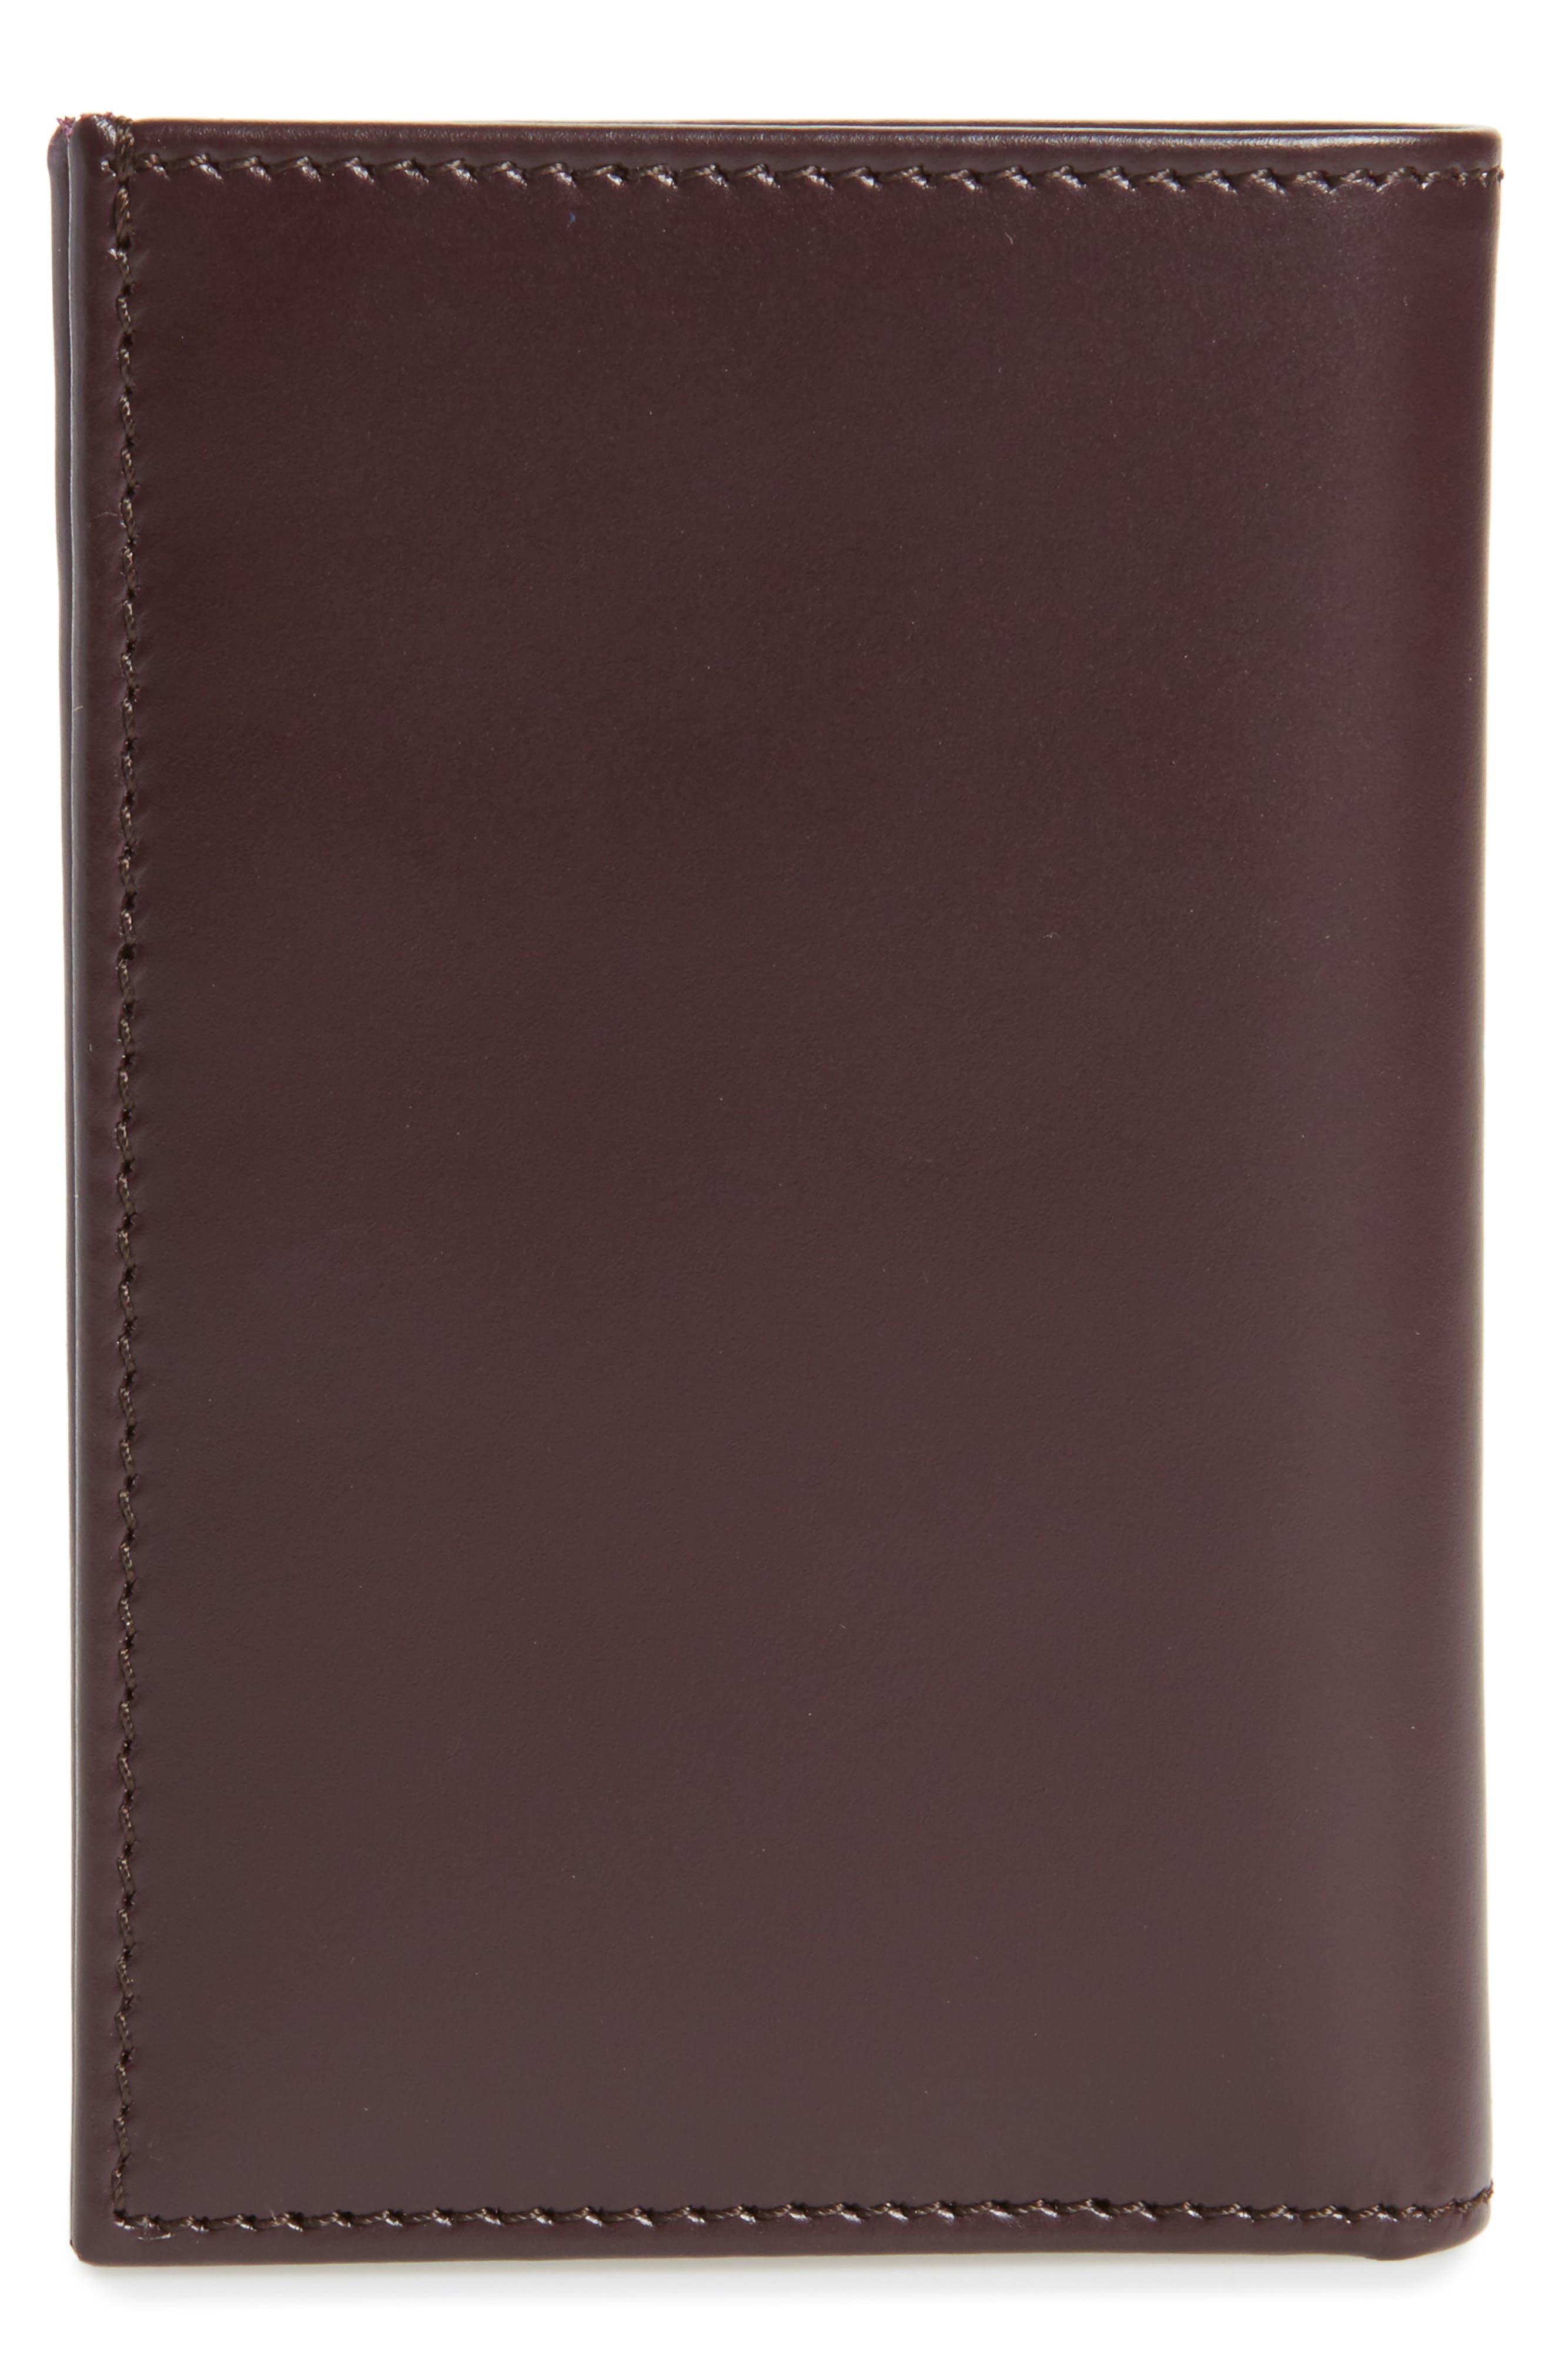 Multistripe Leather Card Case,                             Alternate thumbnail 3, color,                             Burgundy